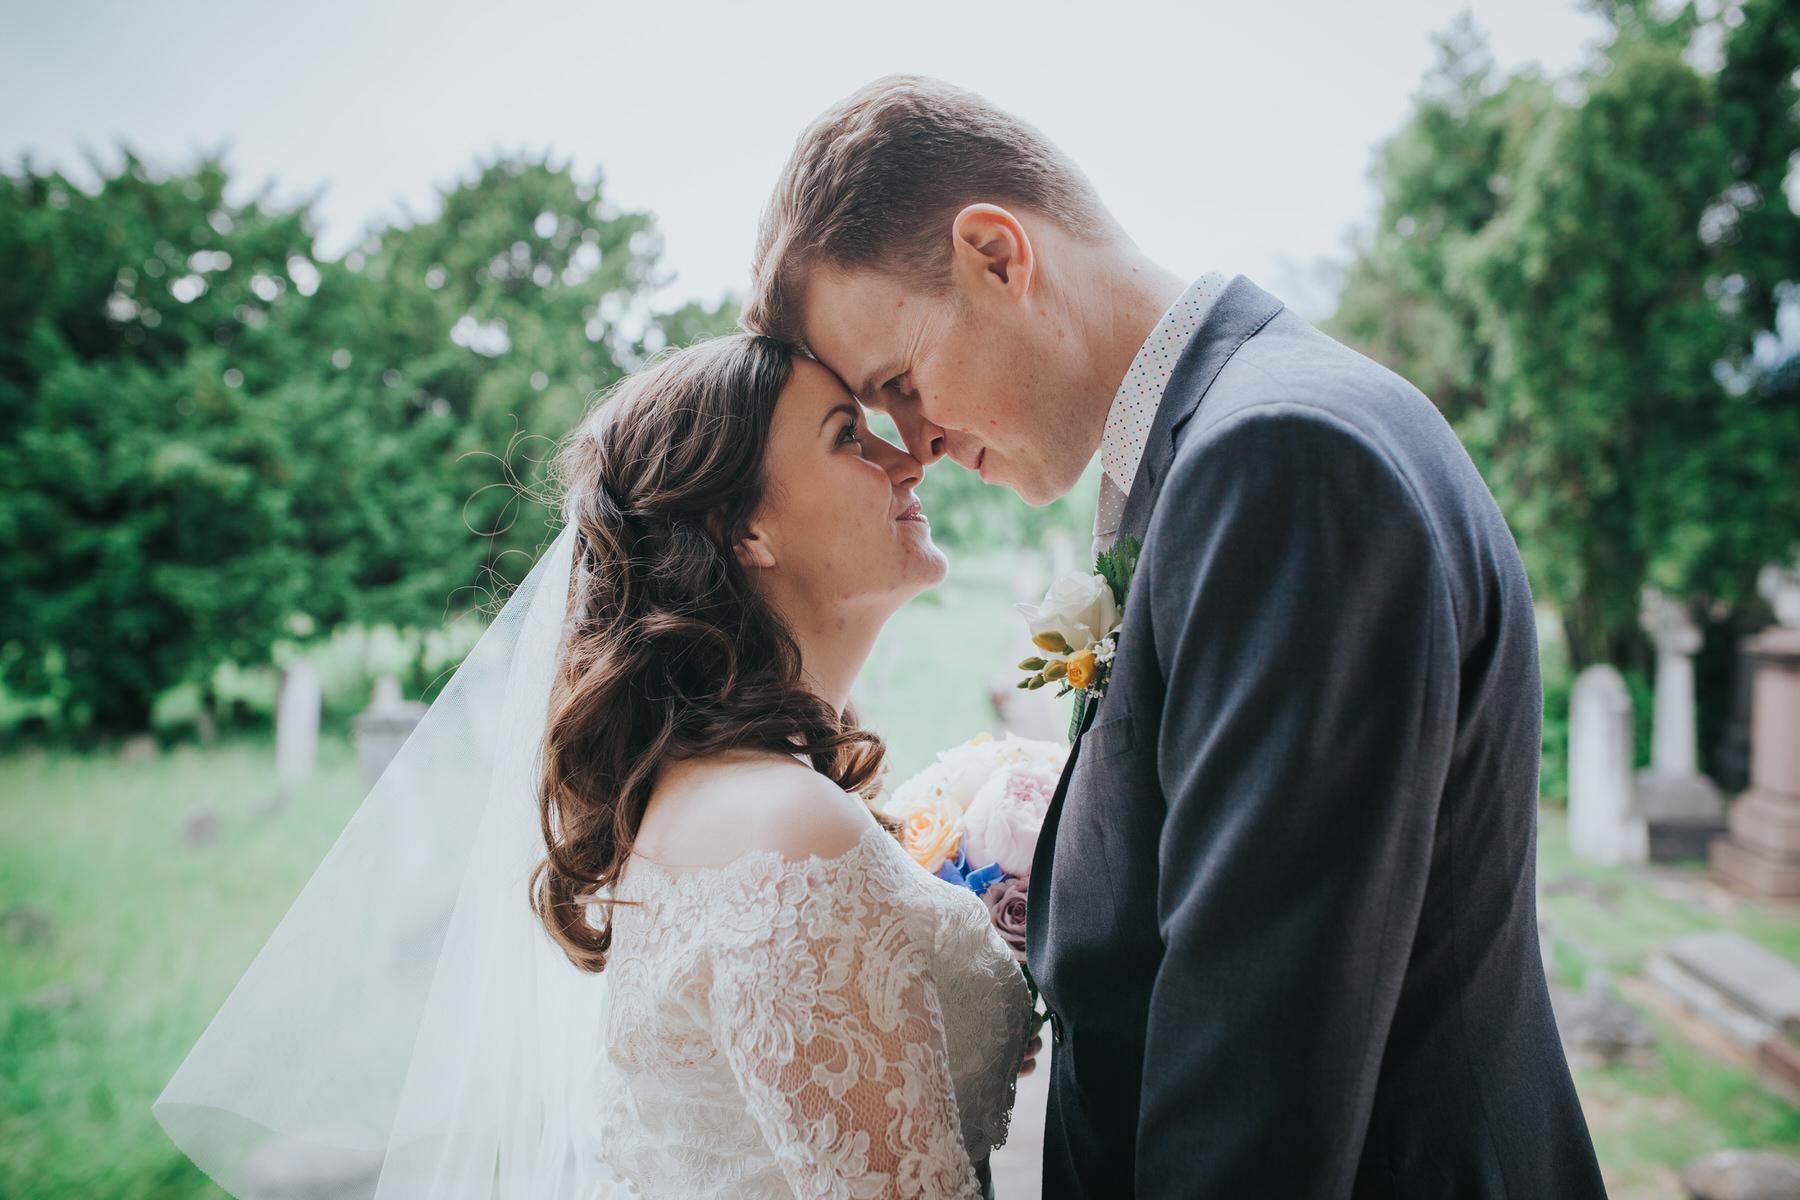 groom bride wedding portraits Brompton Cemetery Chelsea photographer.jpg